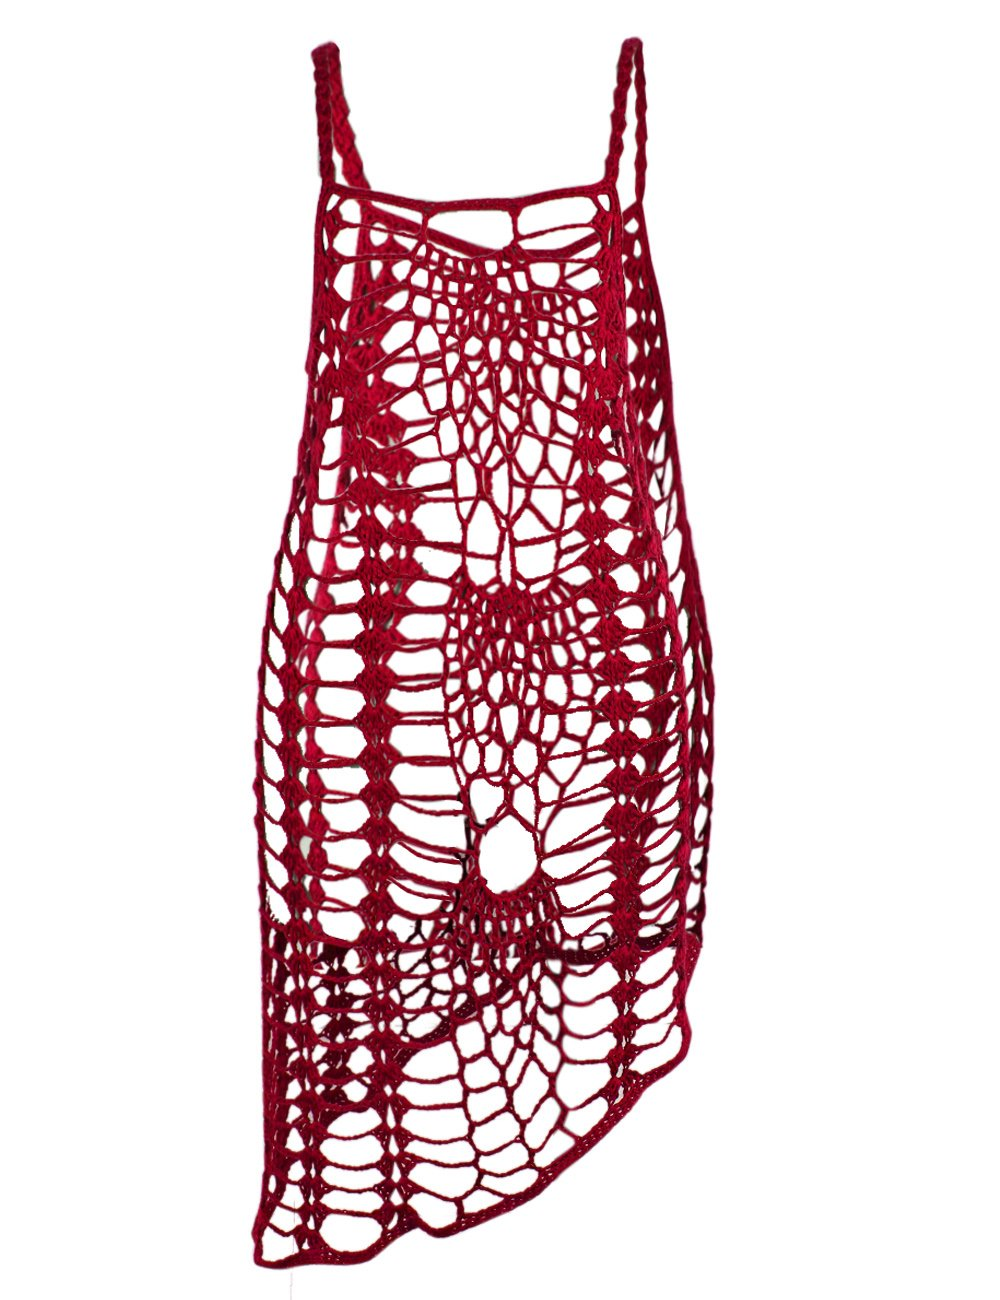 fbea68c22600d Galleon - Shermie Women's Vintage Crochet Lace Bikini Swimsuit Cover Ups  Short Hollow Out Beach Dresses (M, Red)